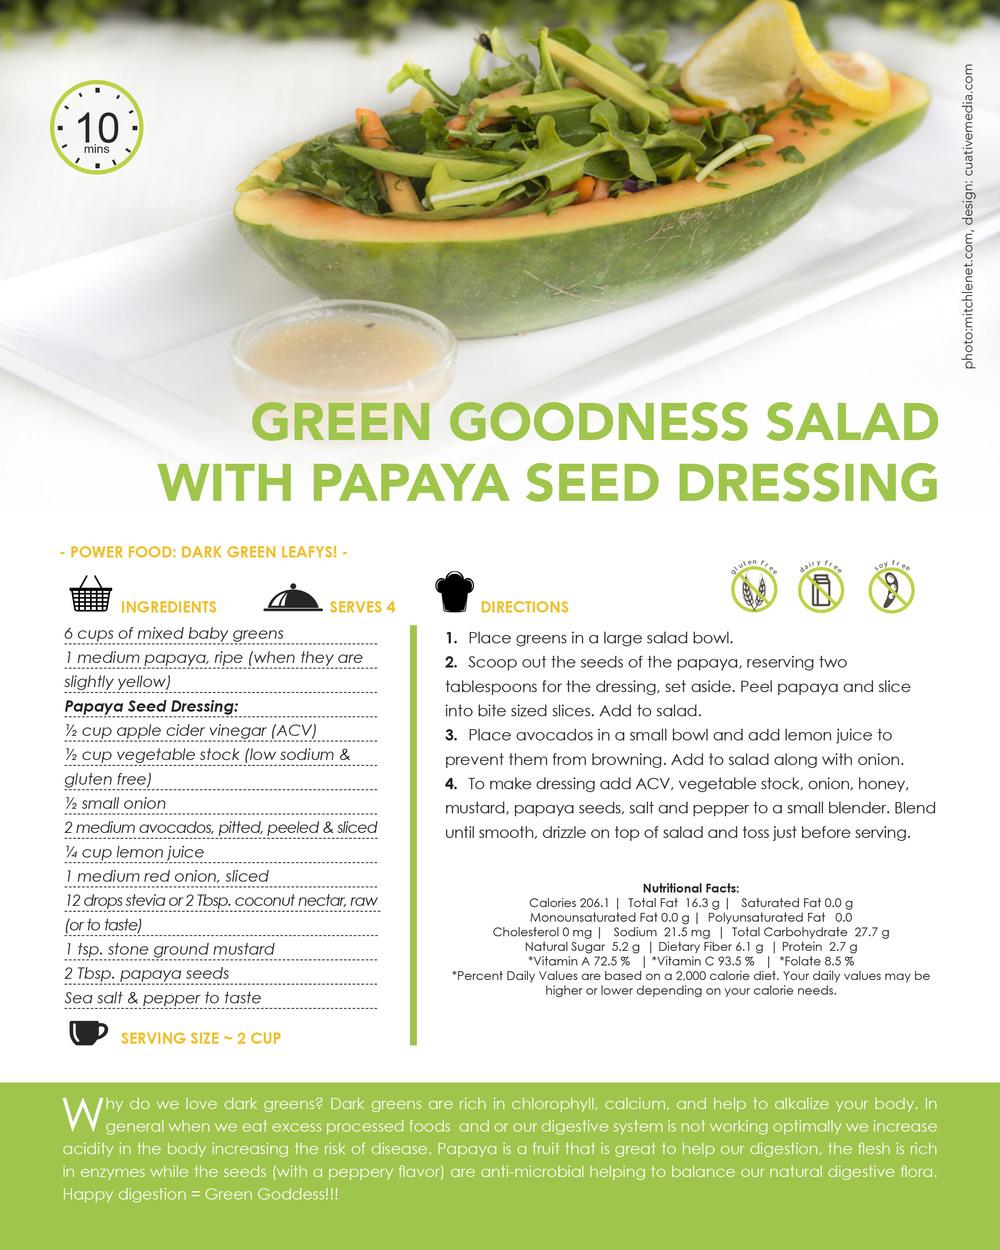 GREEN GOODNESS SALAD WITH PAPAYA SEED DRESSING